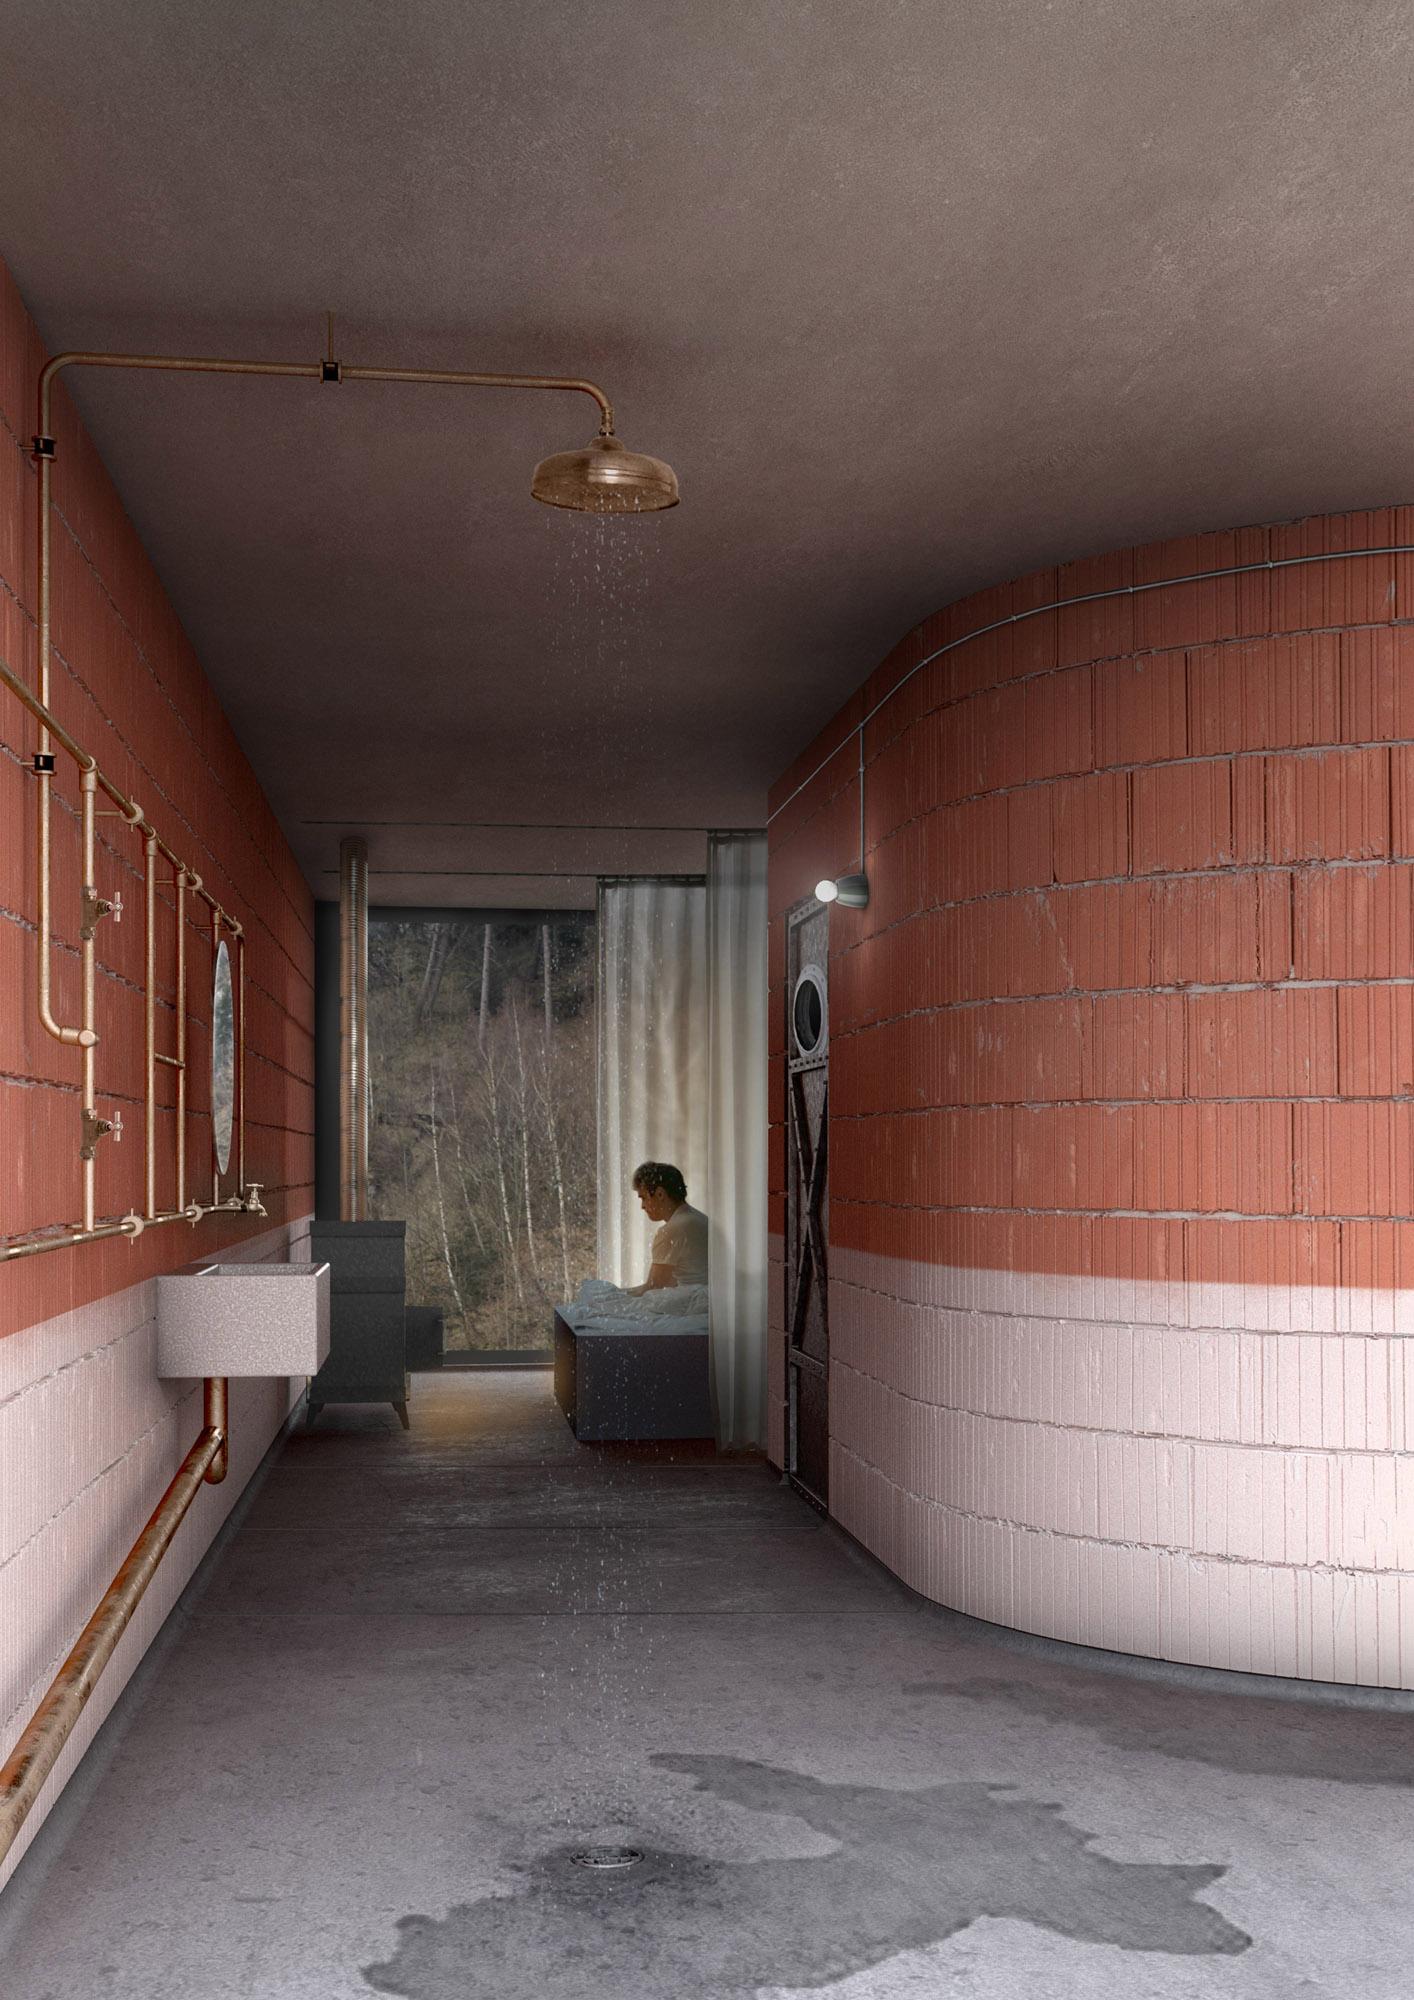 Refurbishing Modernism